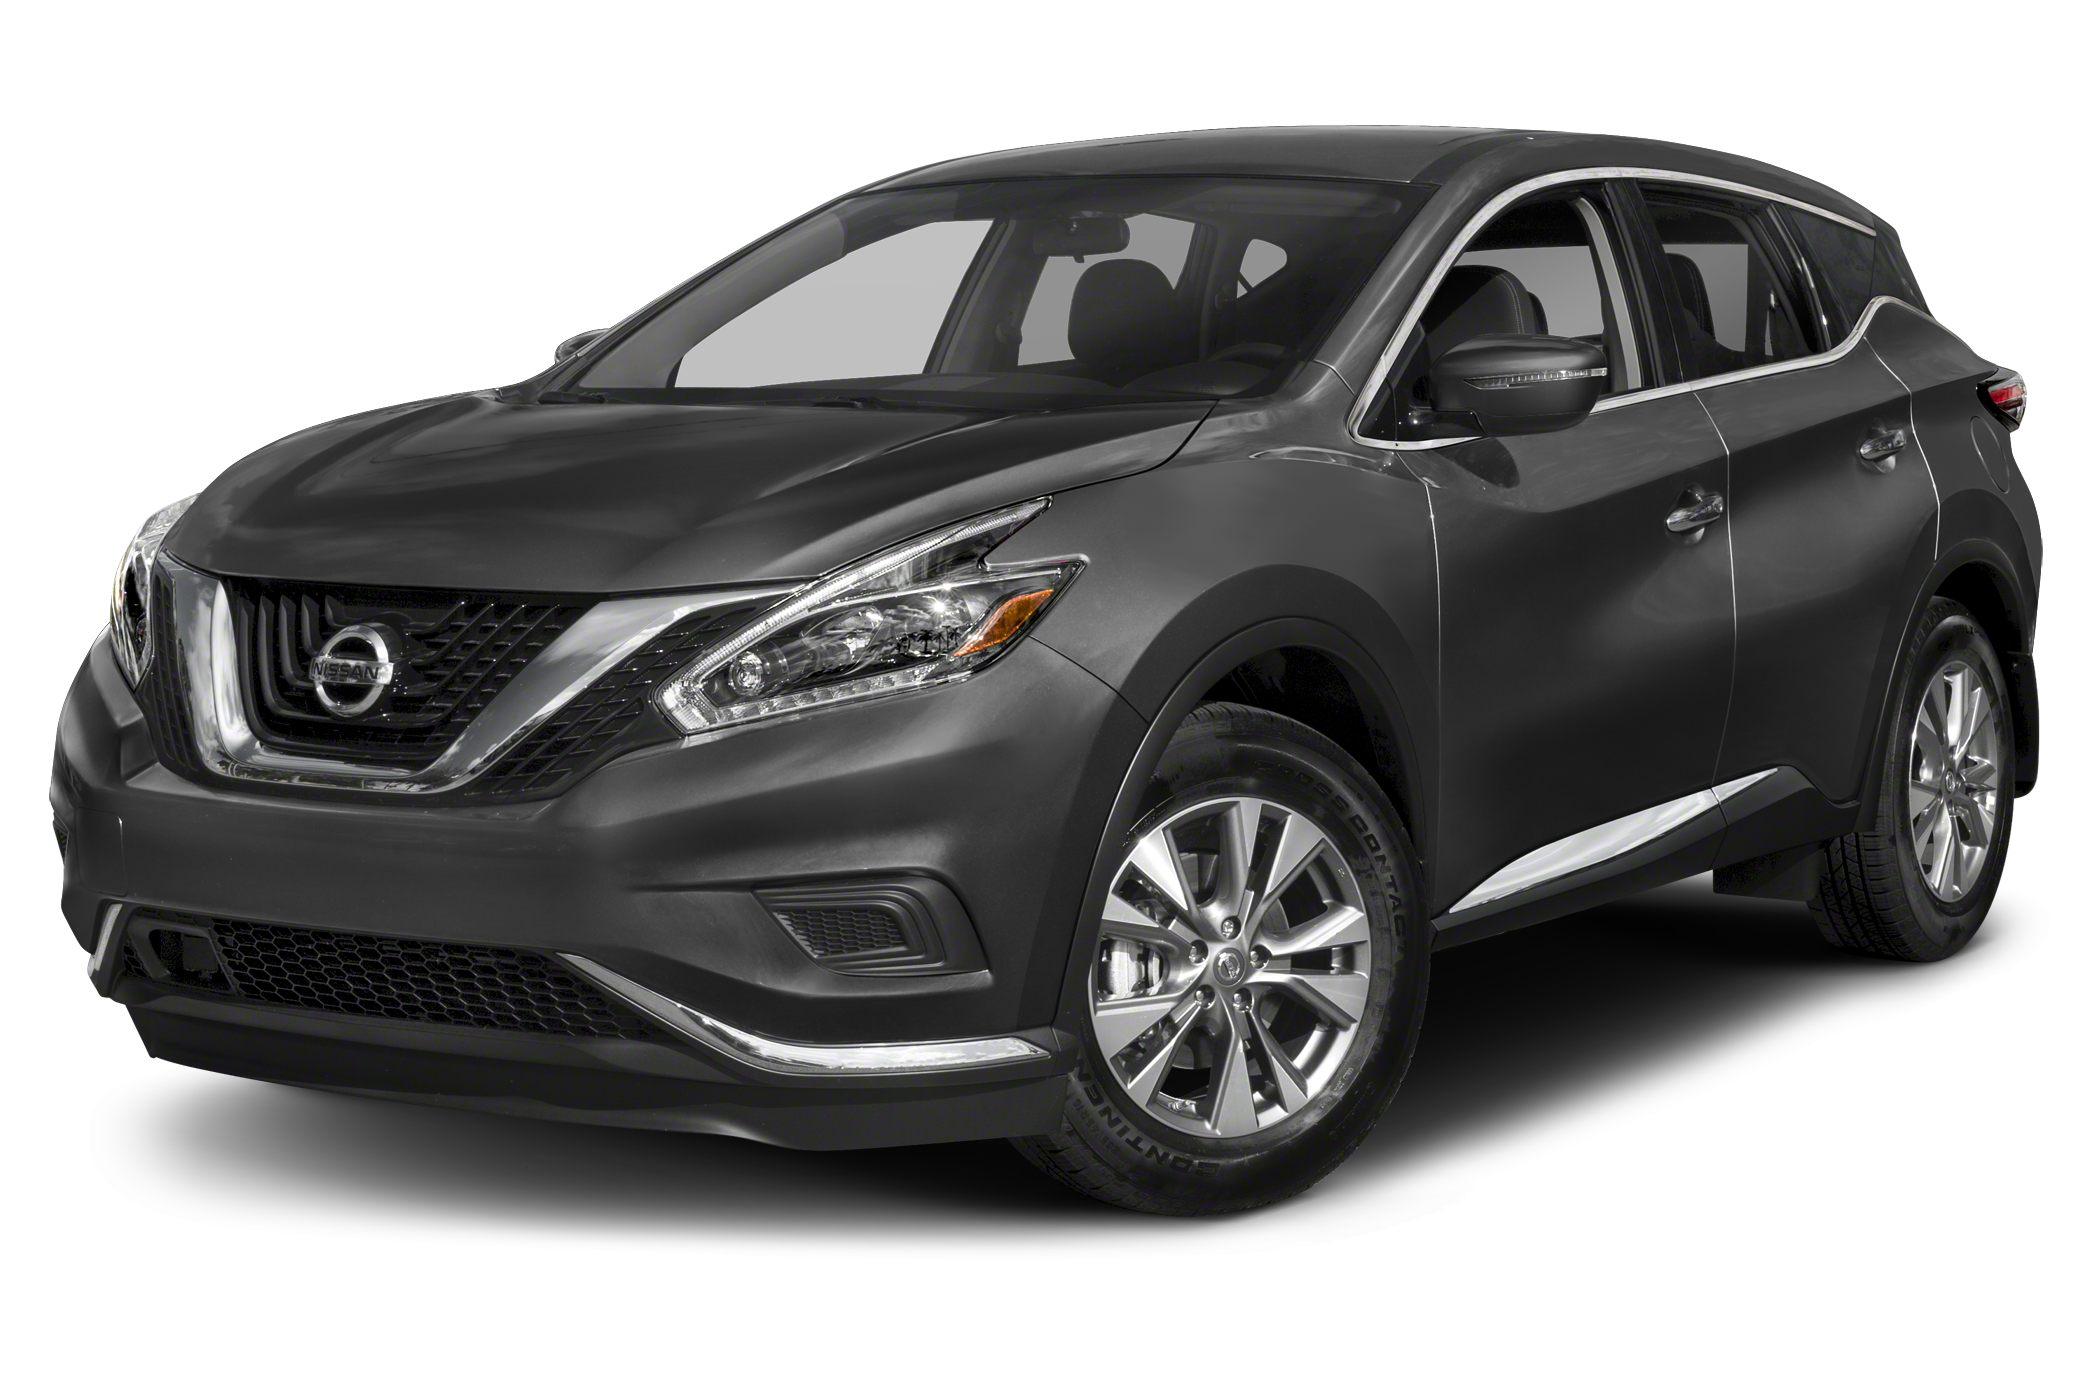 2015 Nissan Murano gets edgier lighter for NY wvideo